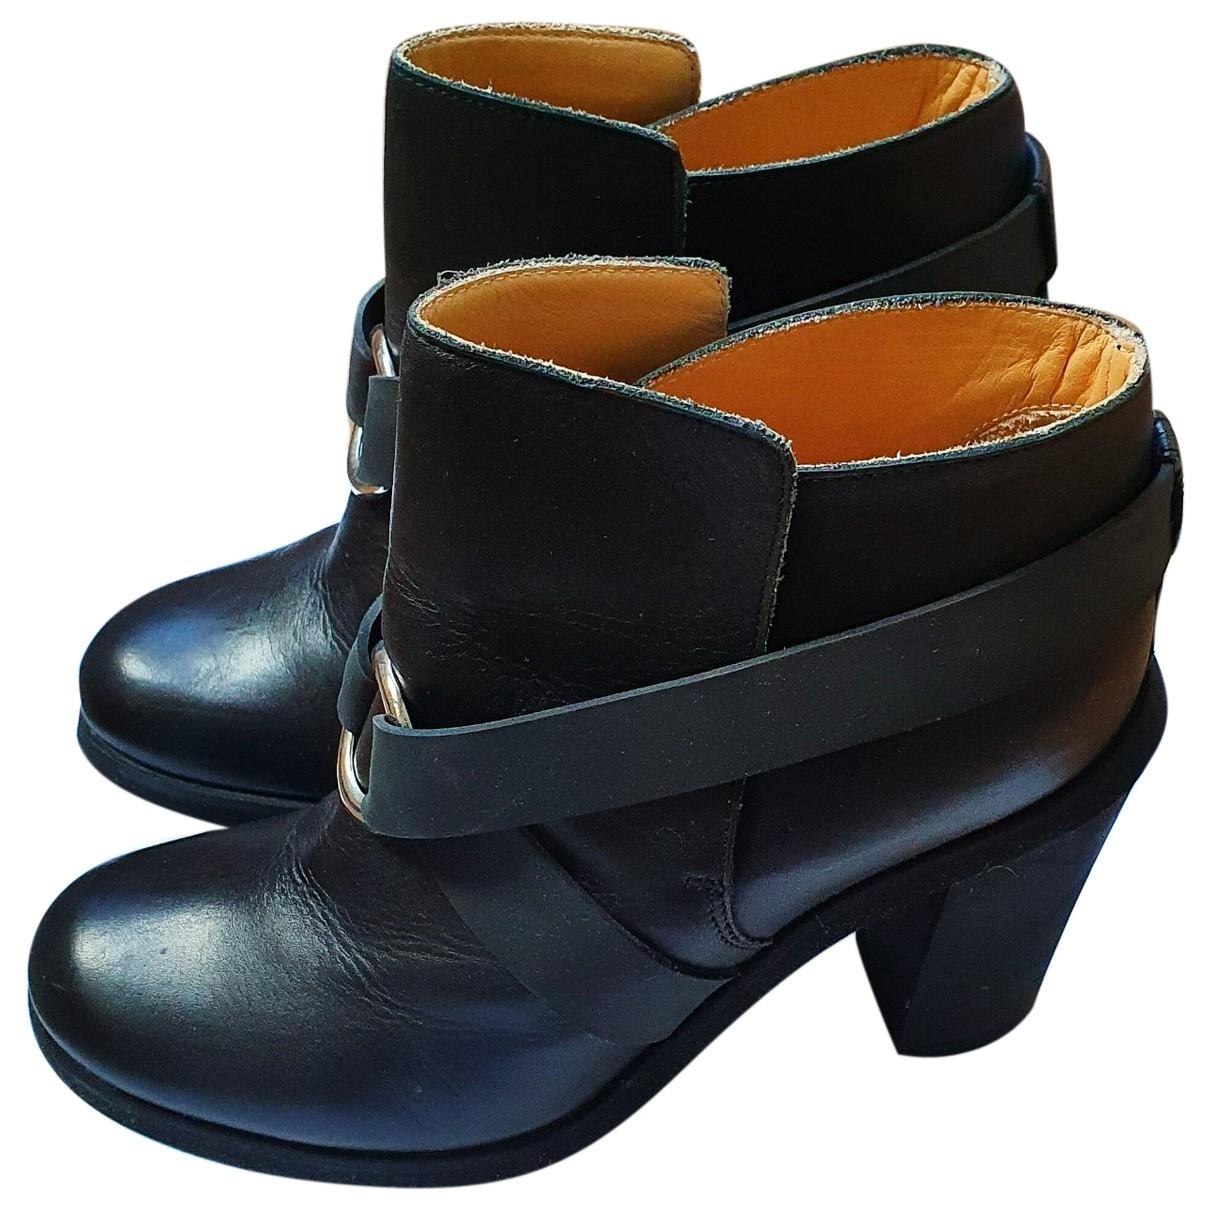 Maison Martin Margiela \N Black Leather Ankle boots for Women 37 EU